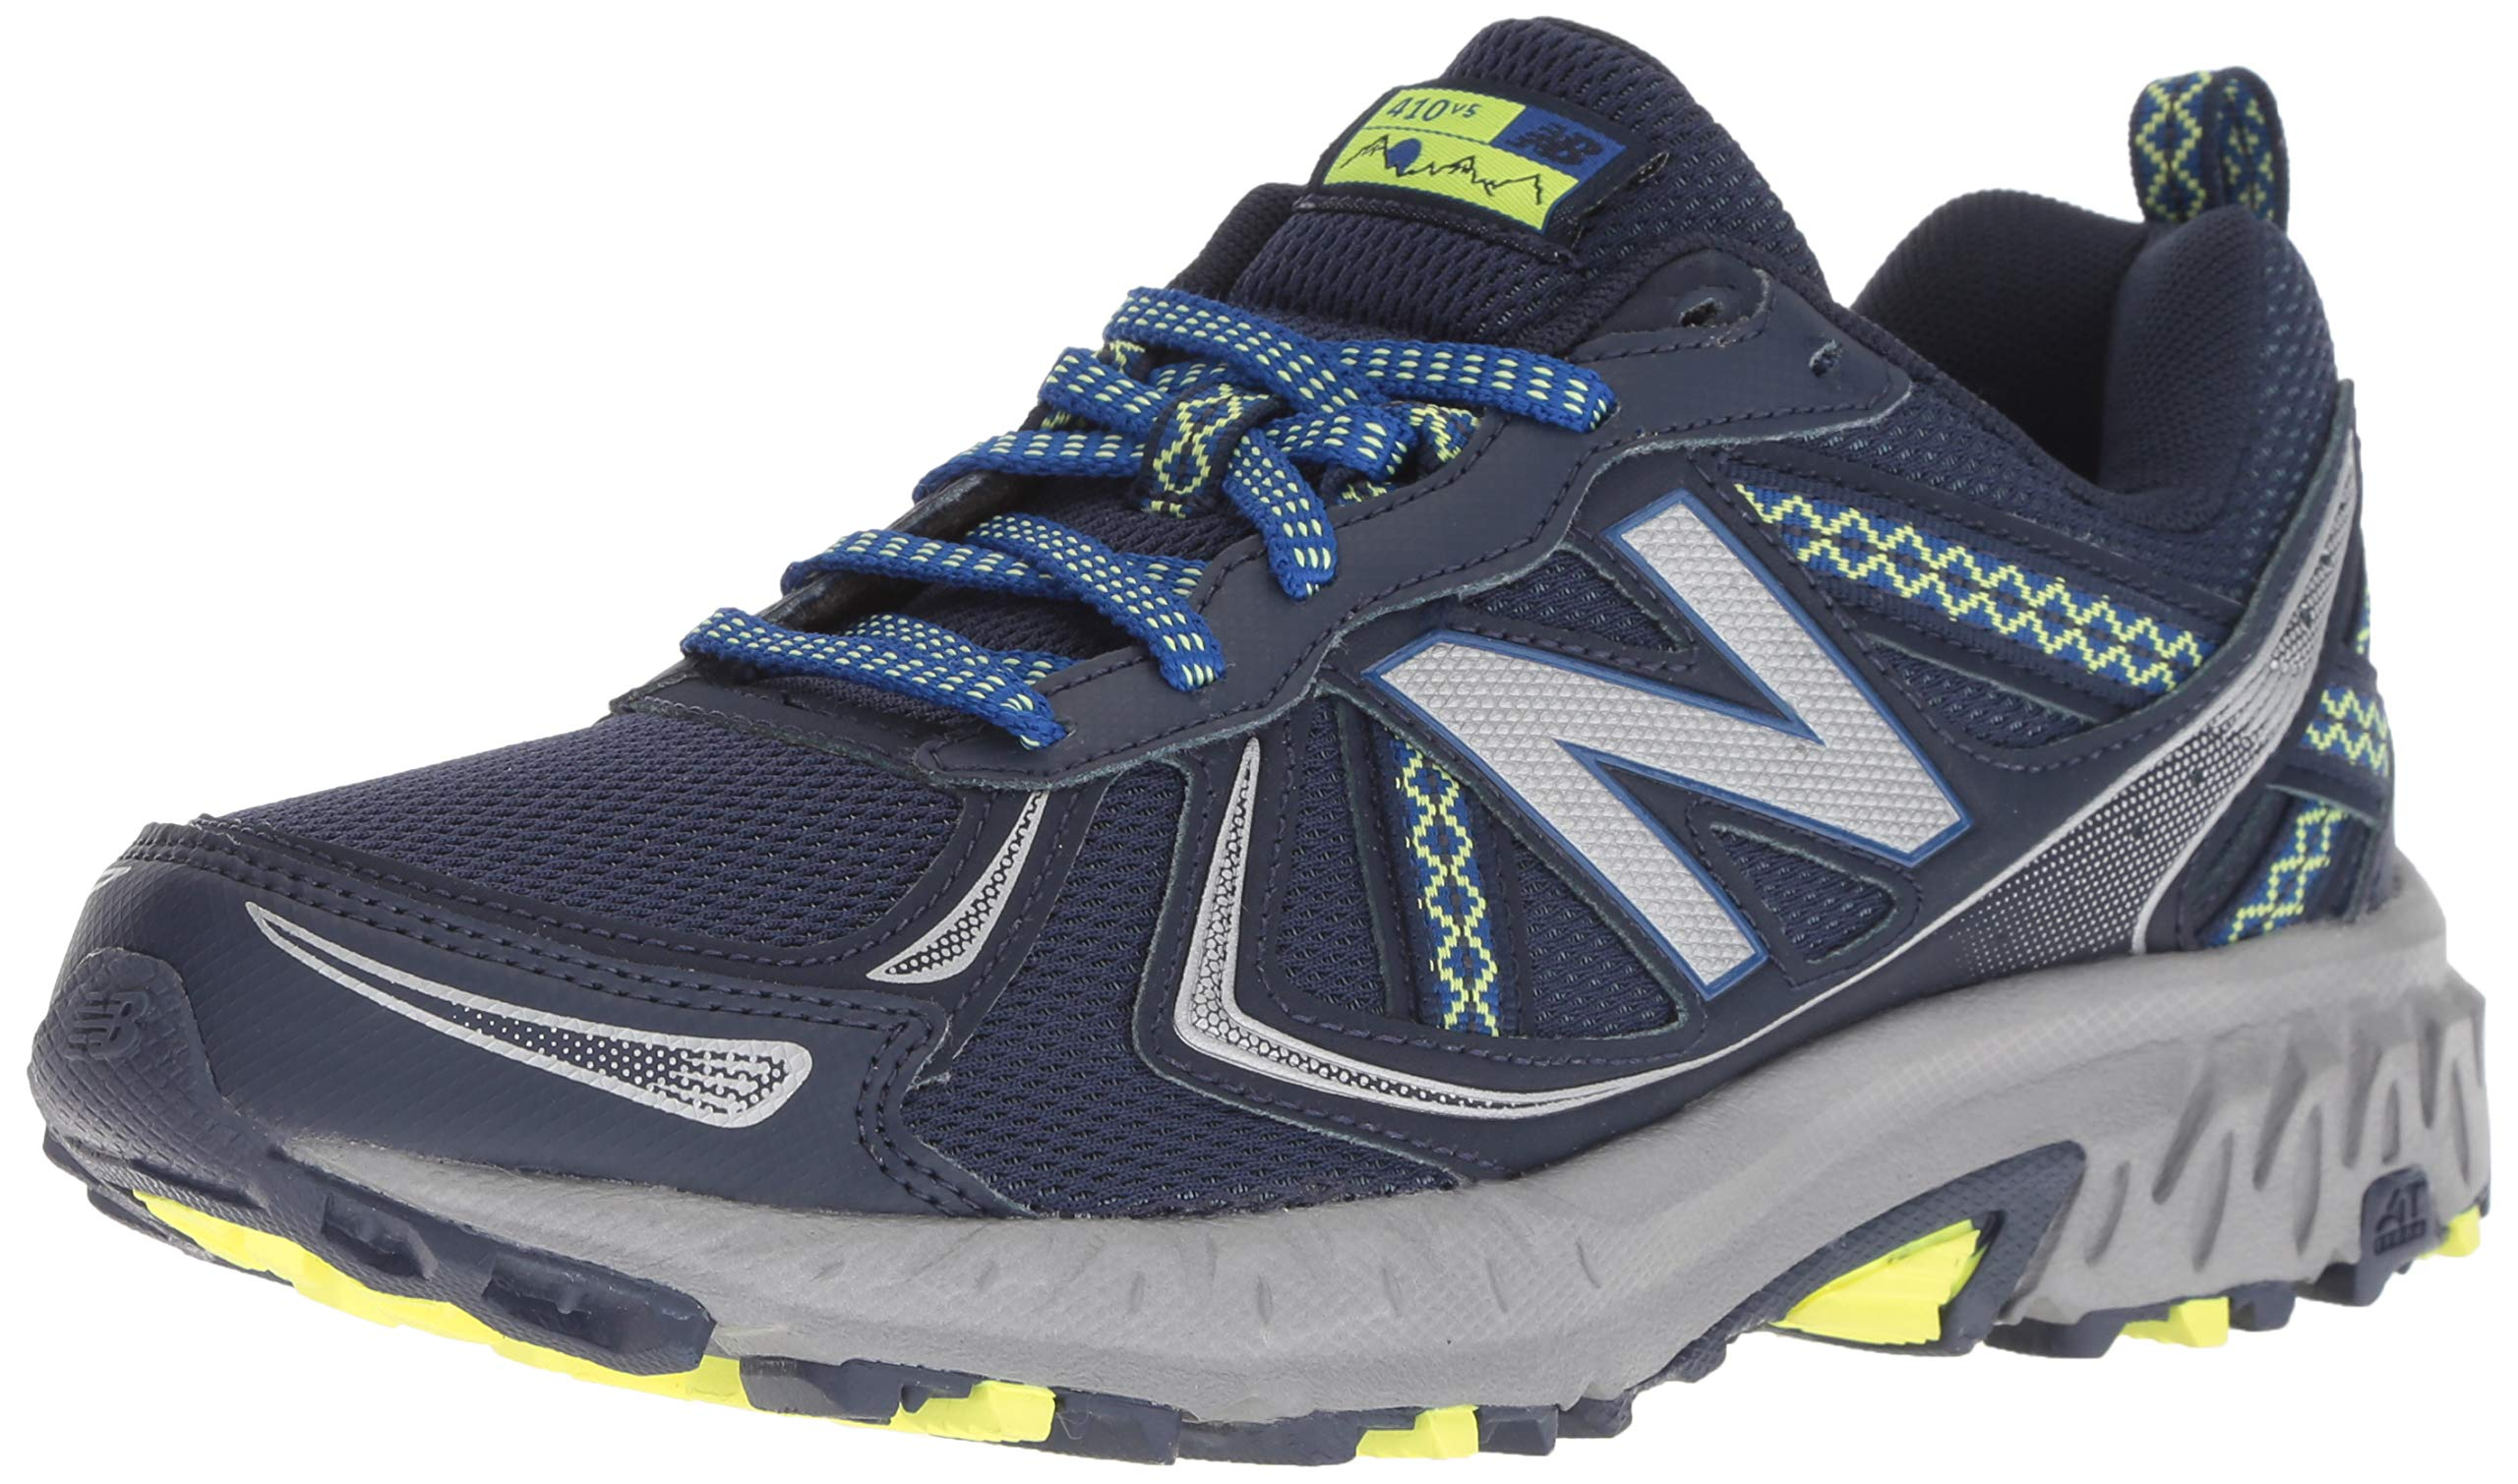 New Balance Women's 410v5 Cushioning Trail Running Shoe, Pigment/Team Royal/Solar Yellow, 5 D US